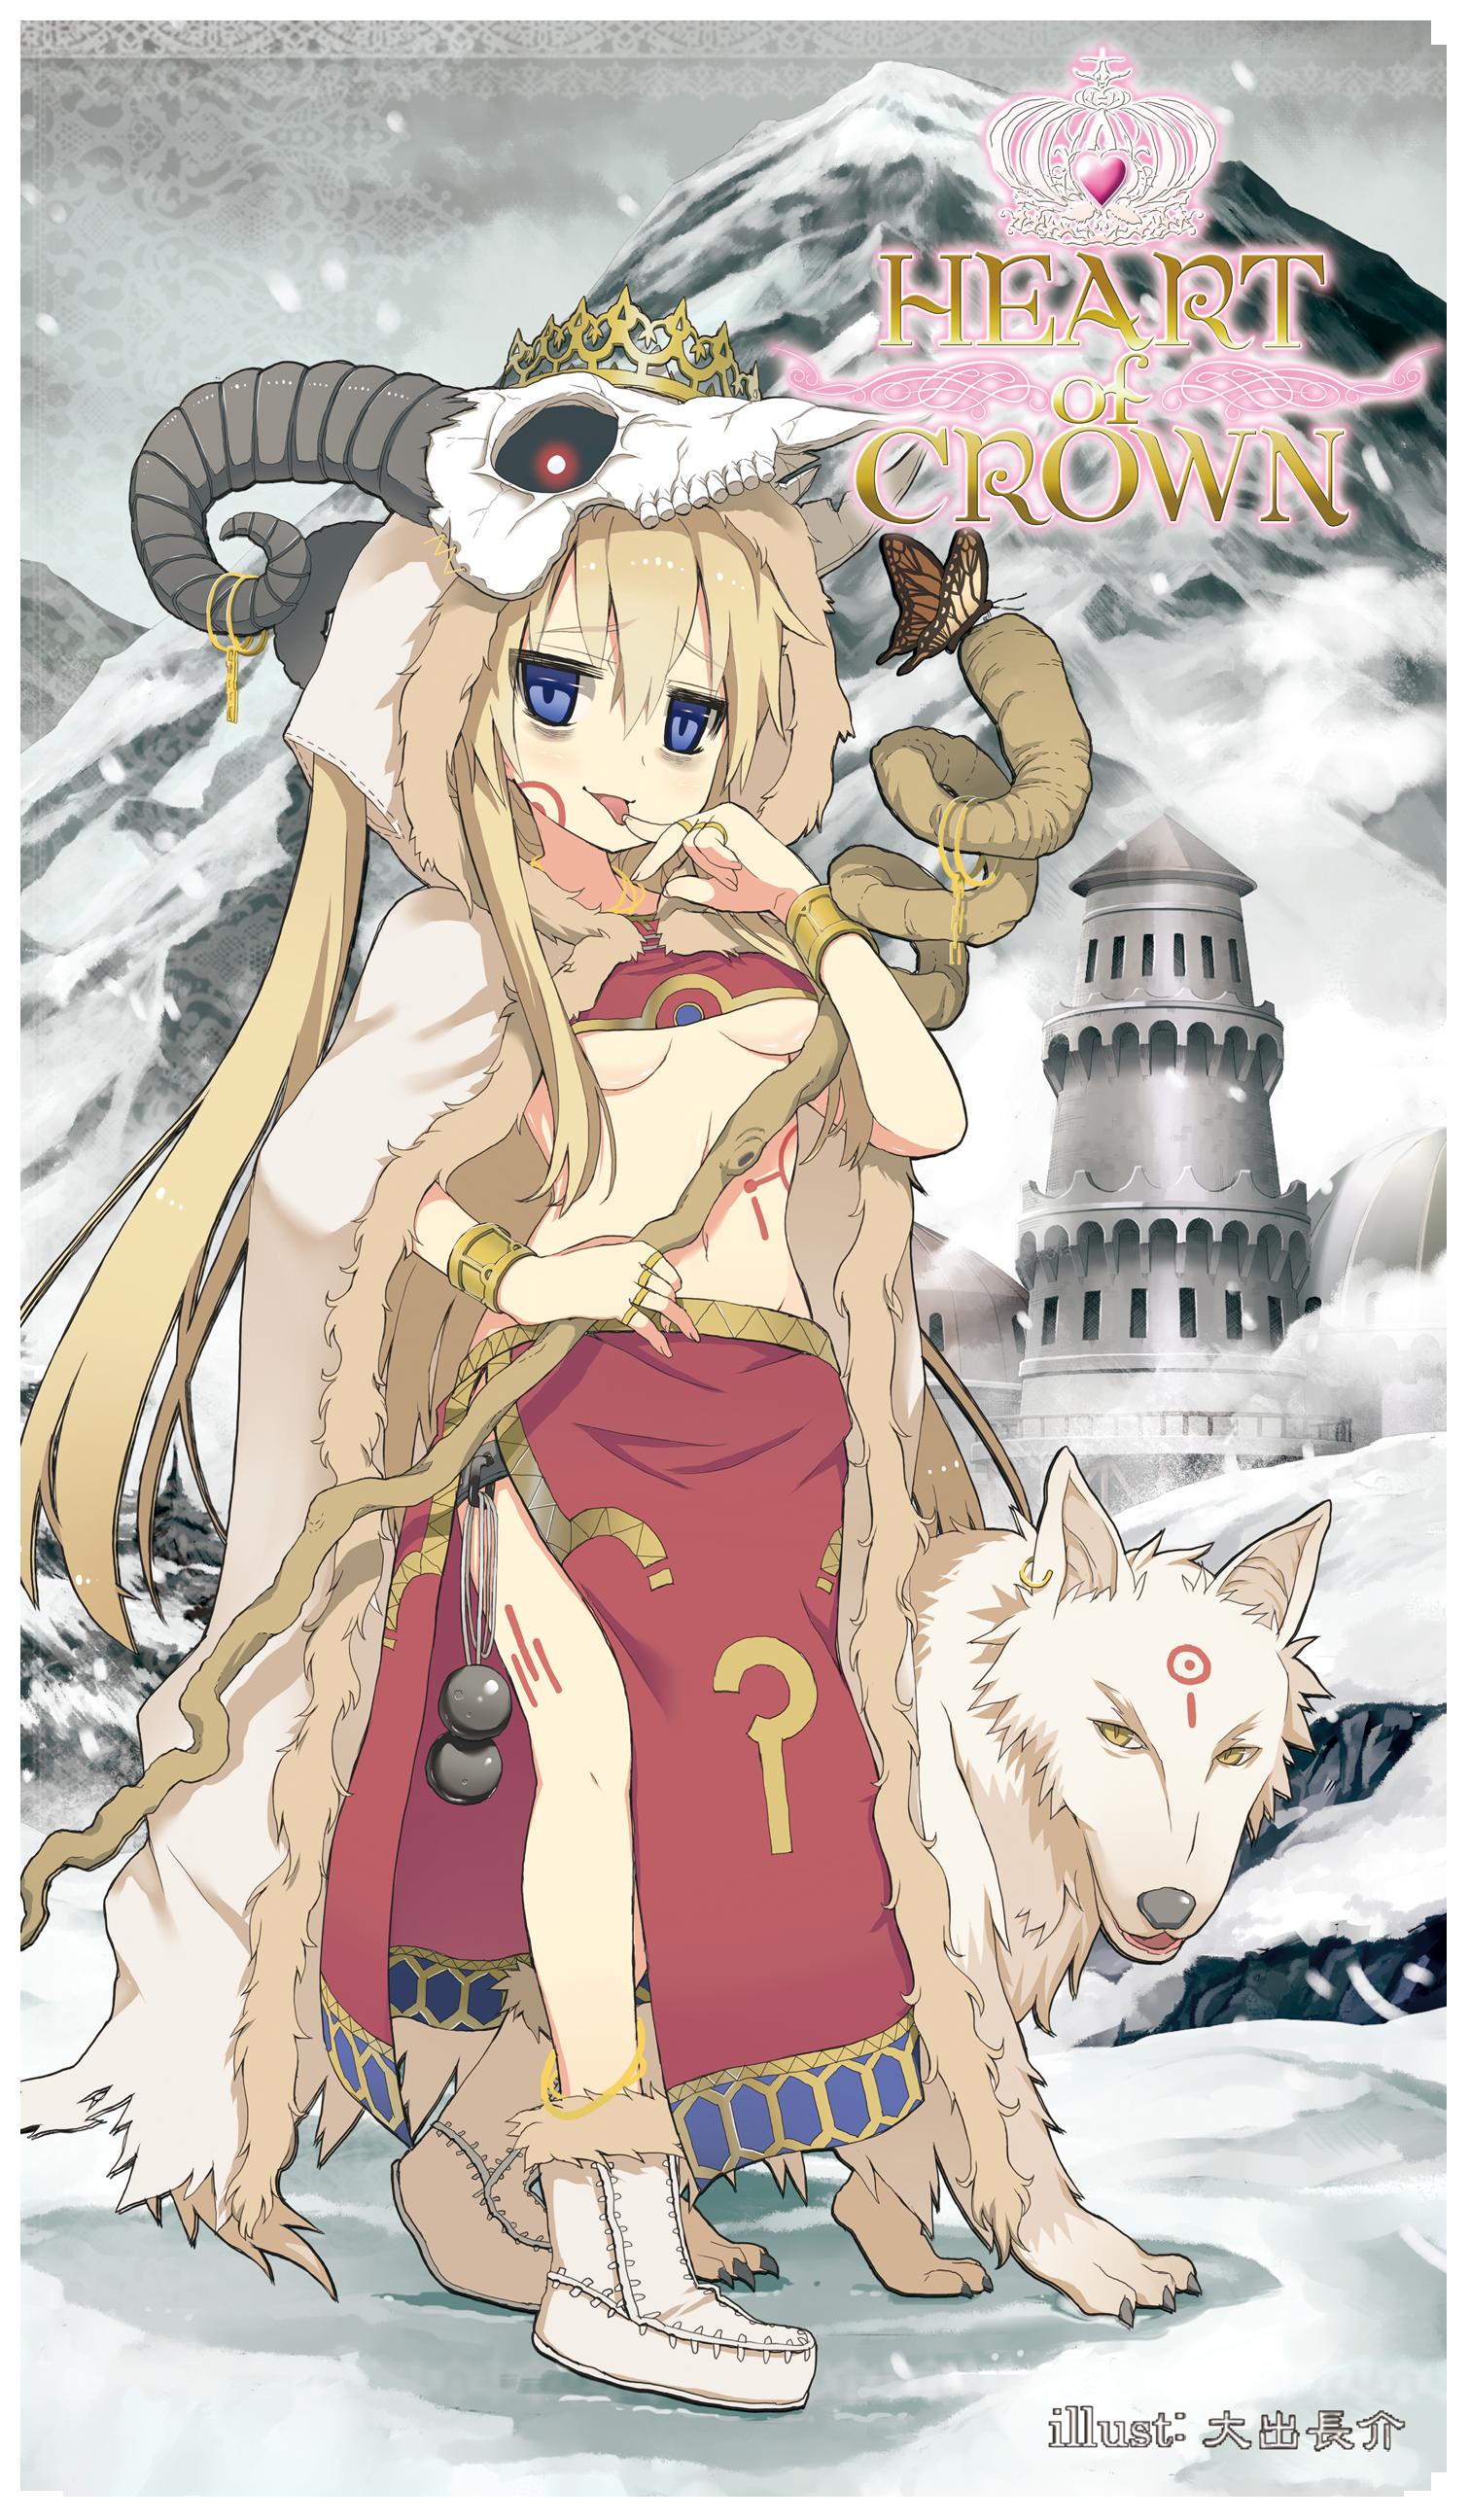 Pin by Japanime Games on Heart of Crown Anime, Manga